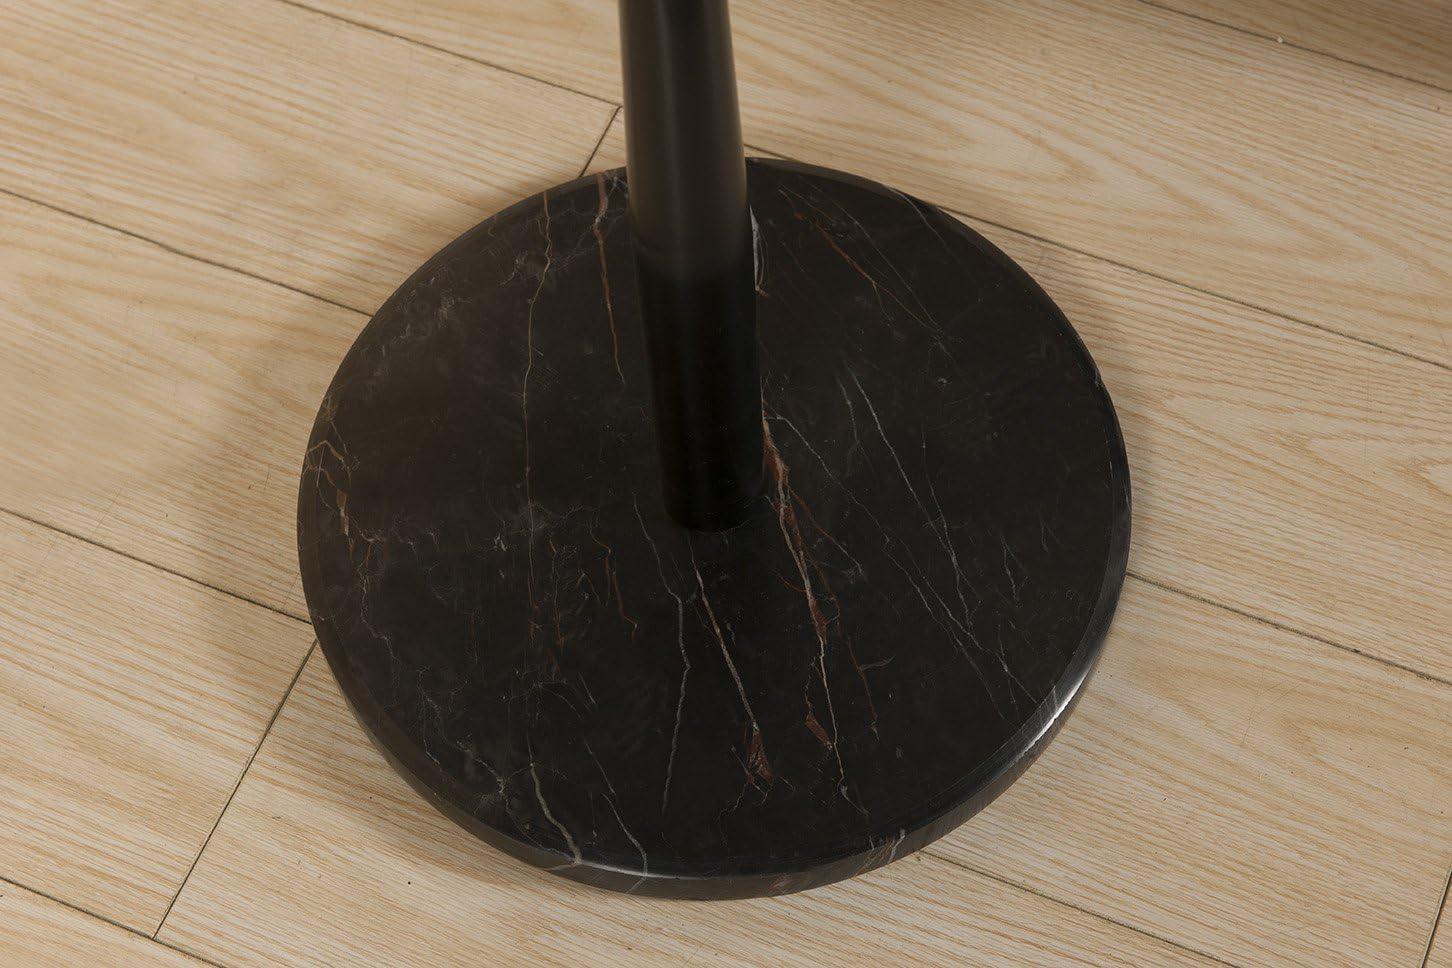 Kings Brand Black Walnut With Marble Base Hall Tree Coat Hat Rack